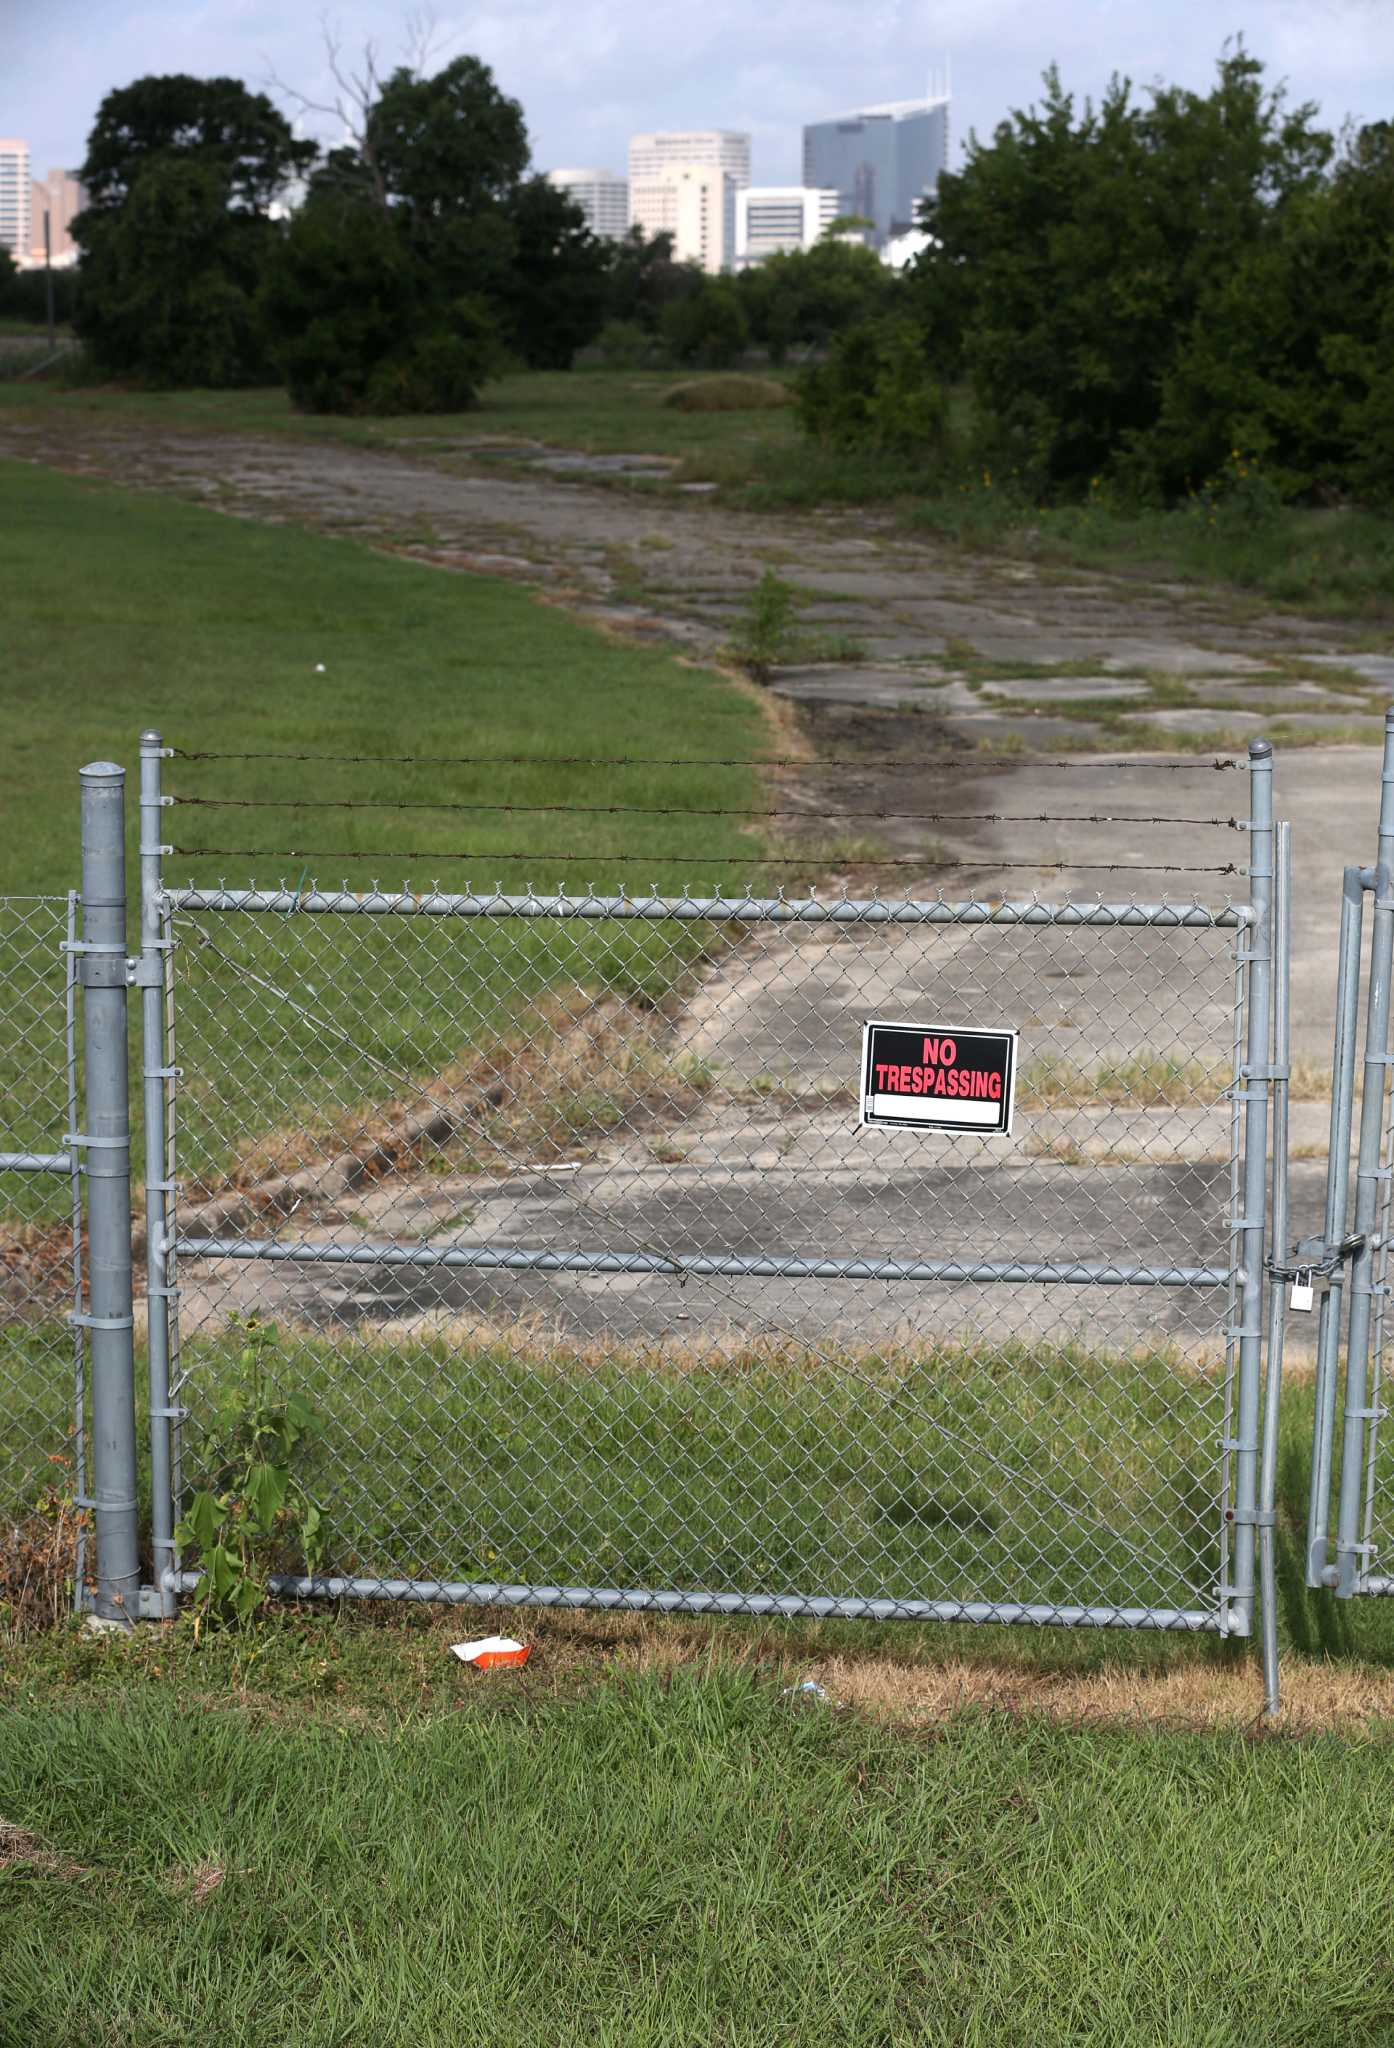 city may buy unused hcc property - houston chronicle